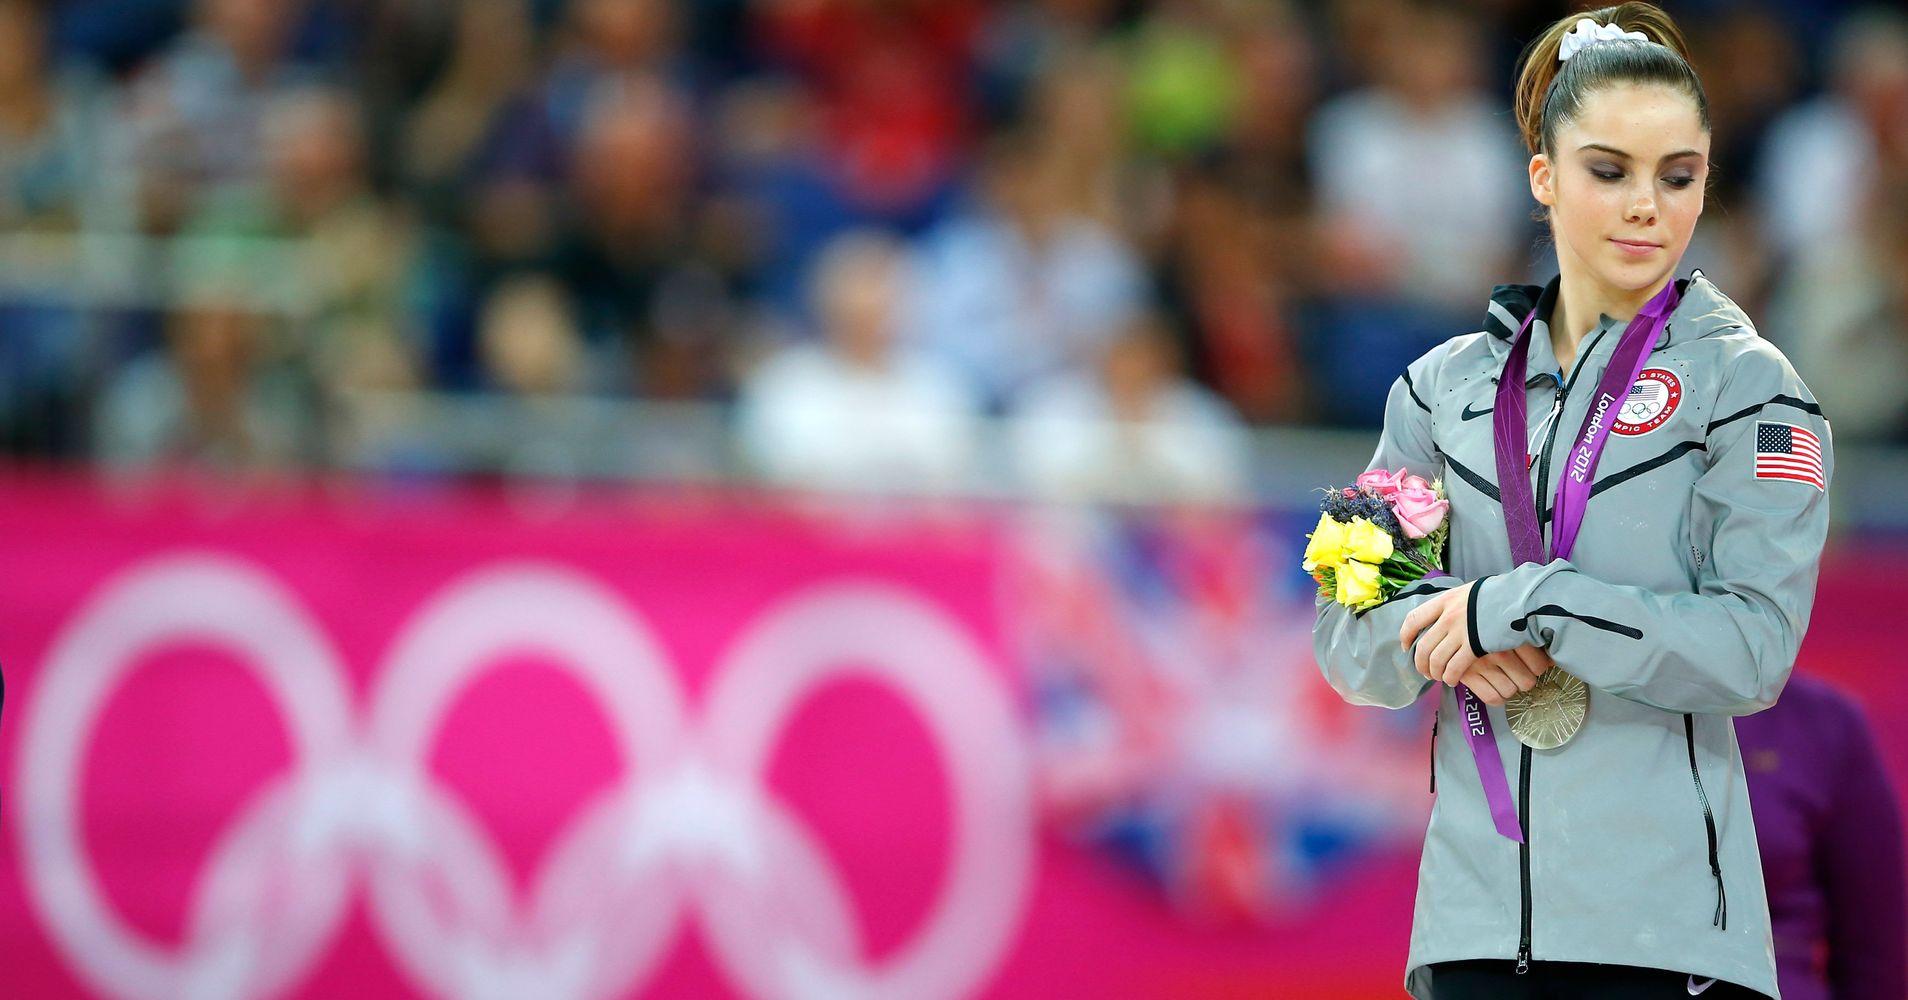 USA Gymnastics Won't Seek To Punish McKayla Maroney For Speaking About Nassar Abuse